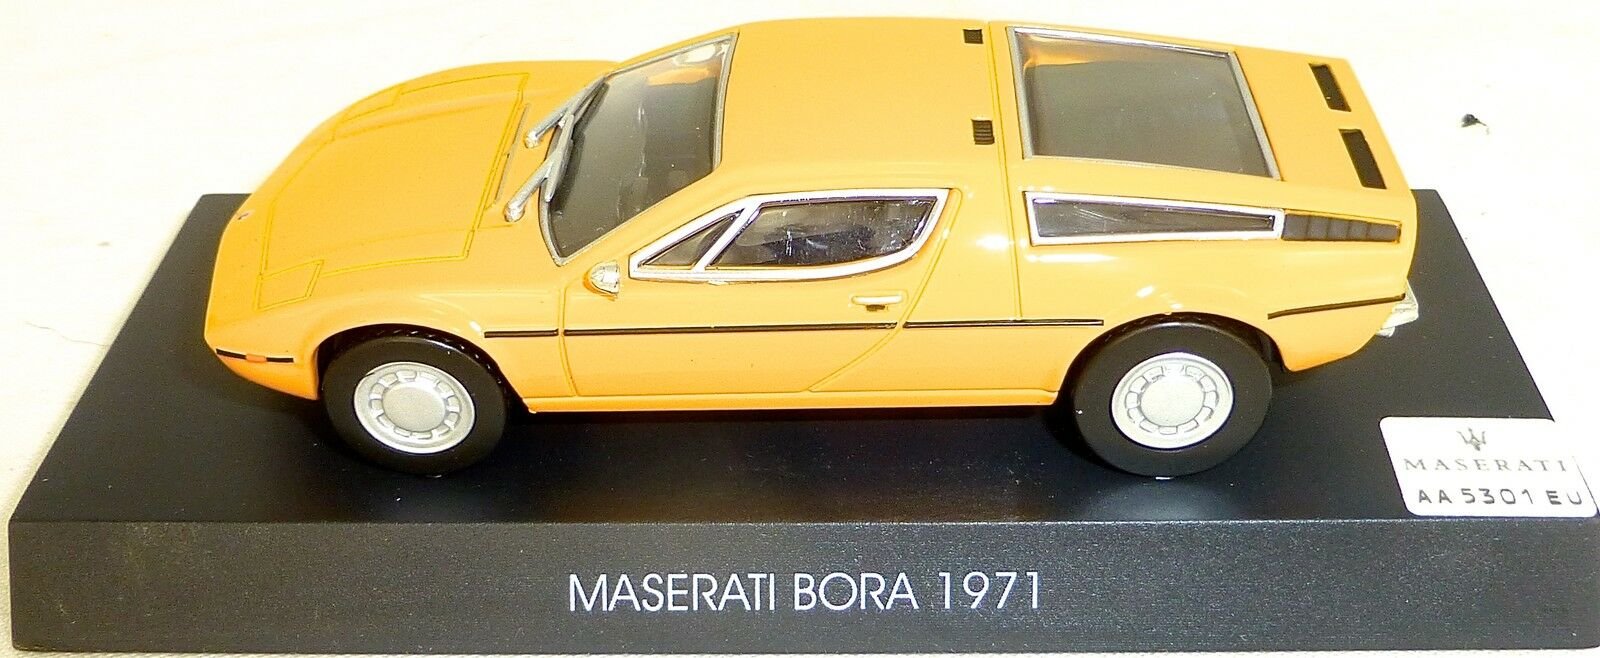 Maserati Bora yellow yellow yellow 1971 1 43 Nuovo Ke Å fdfd1a